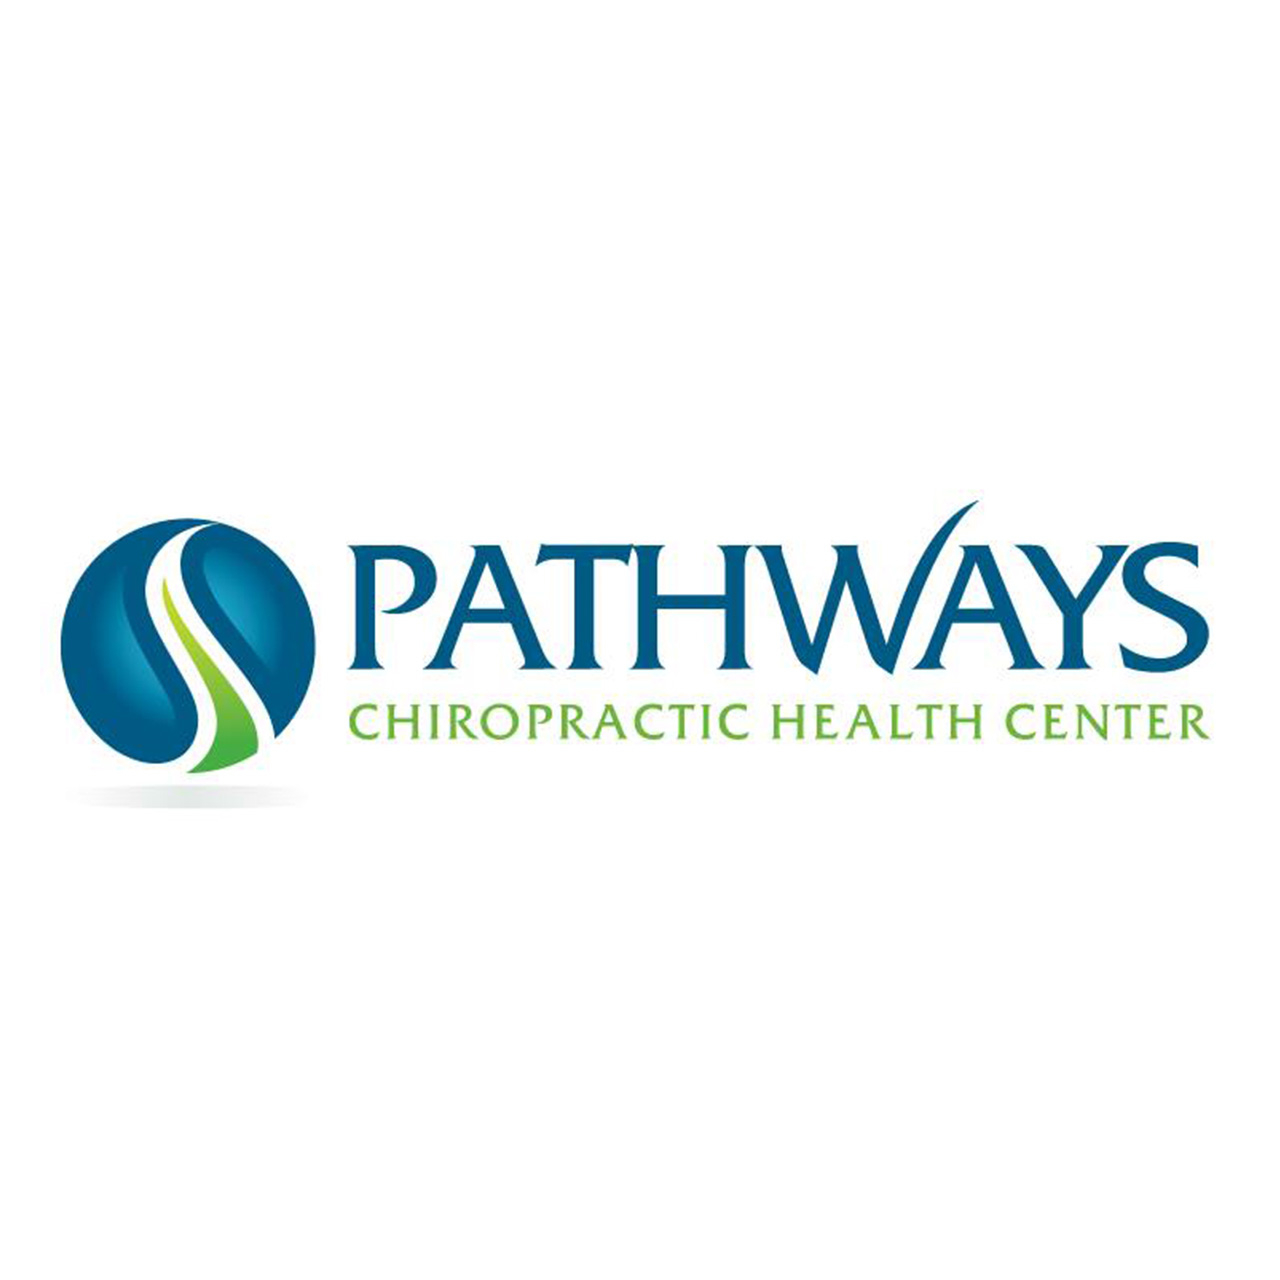 Pathways Chiropractic Health Center